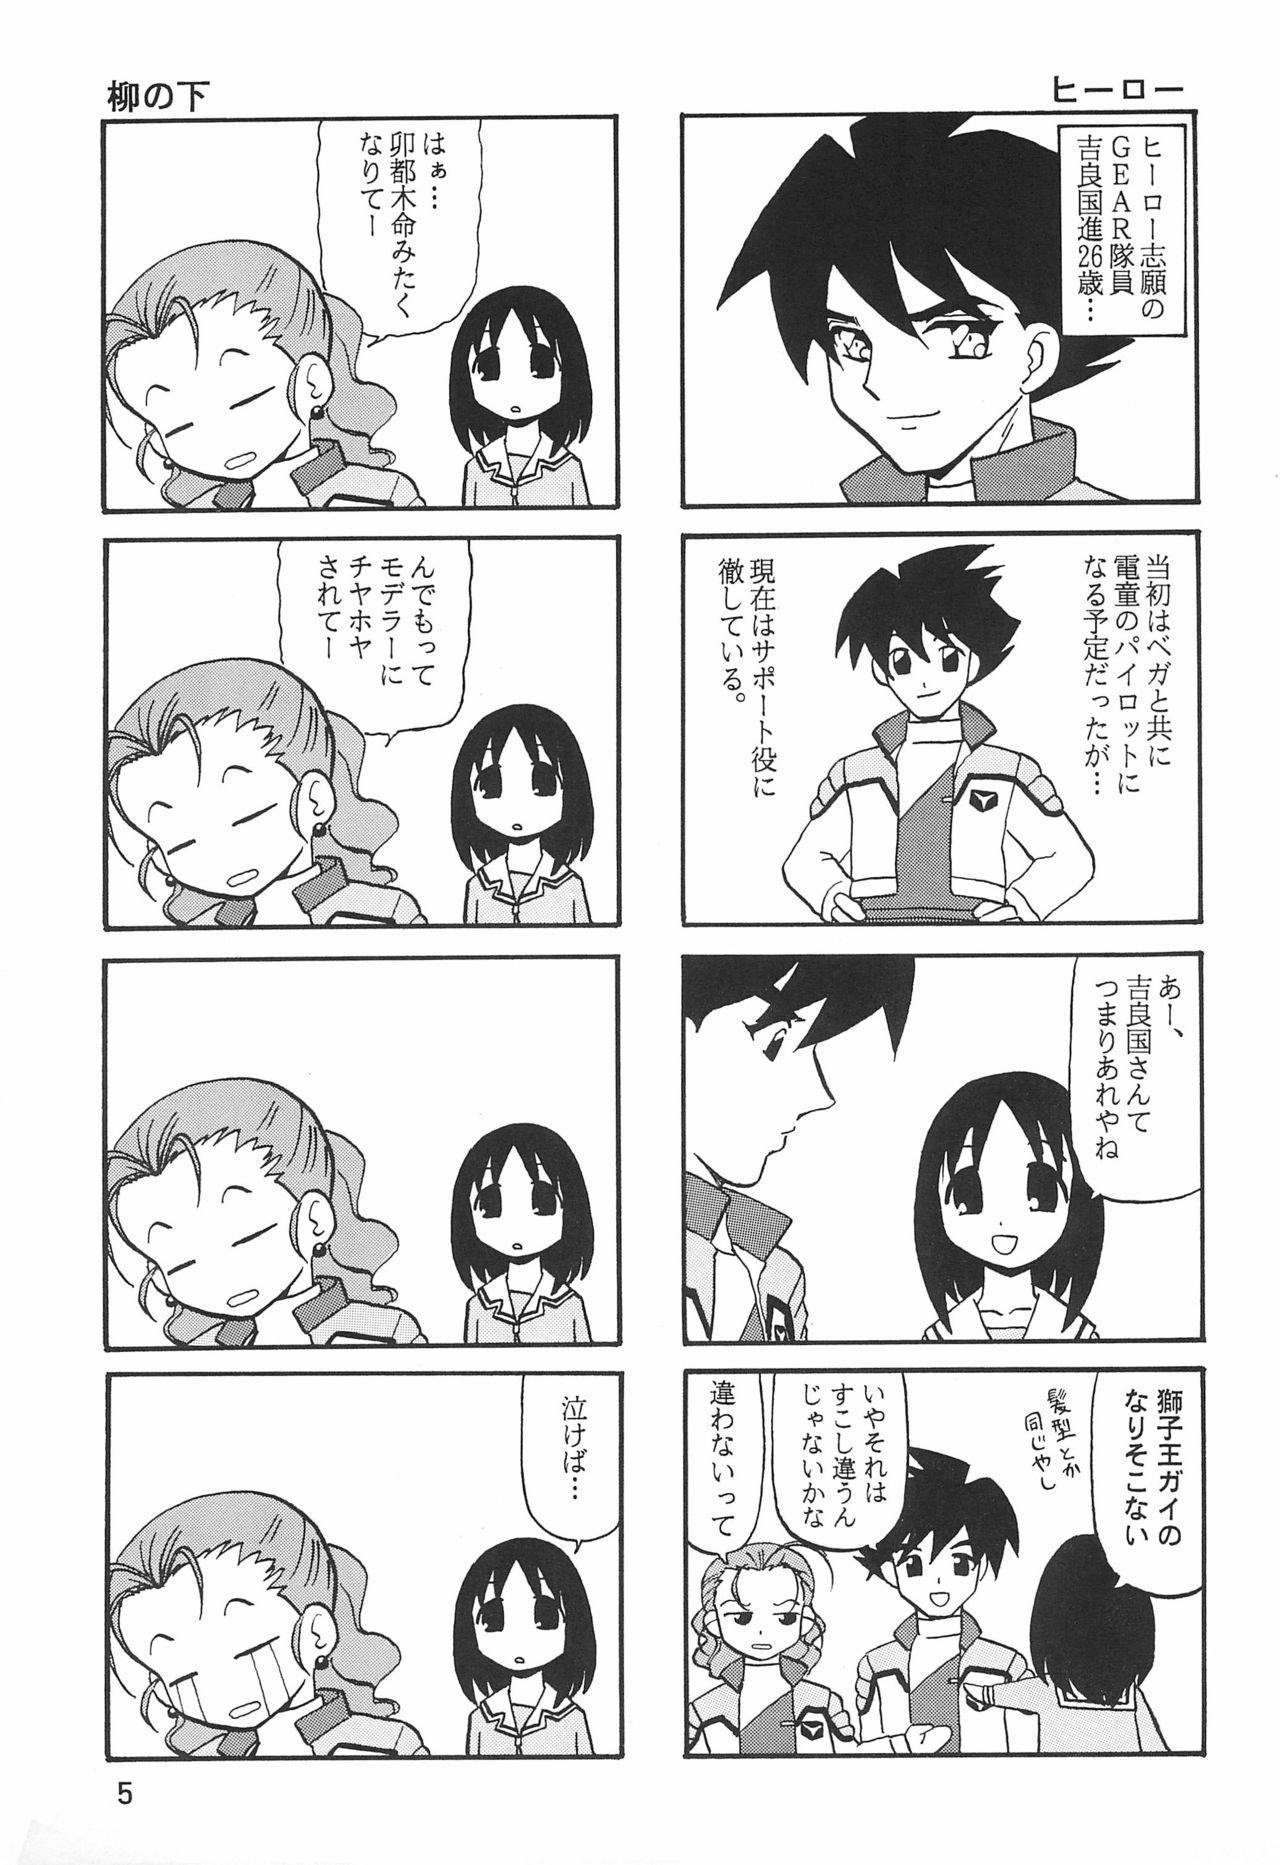 Humming Shoujo-tai 16 4